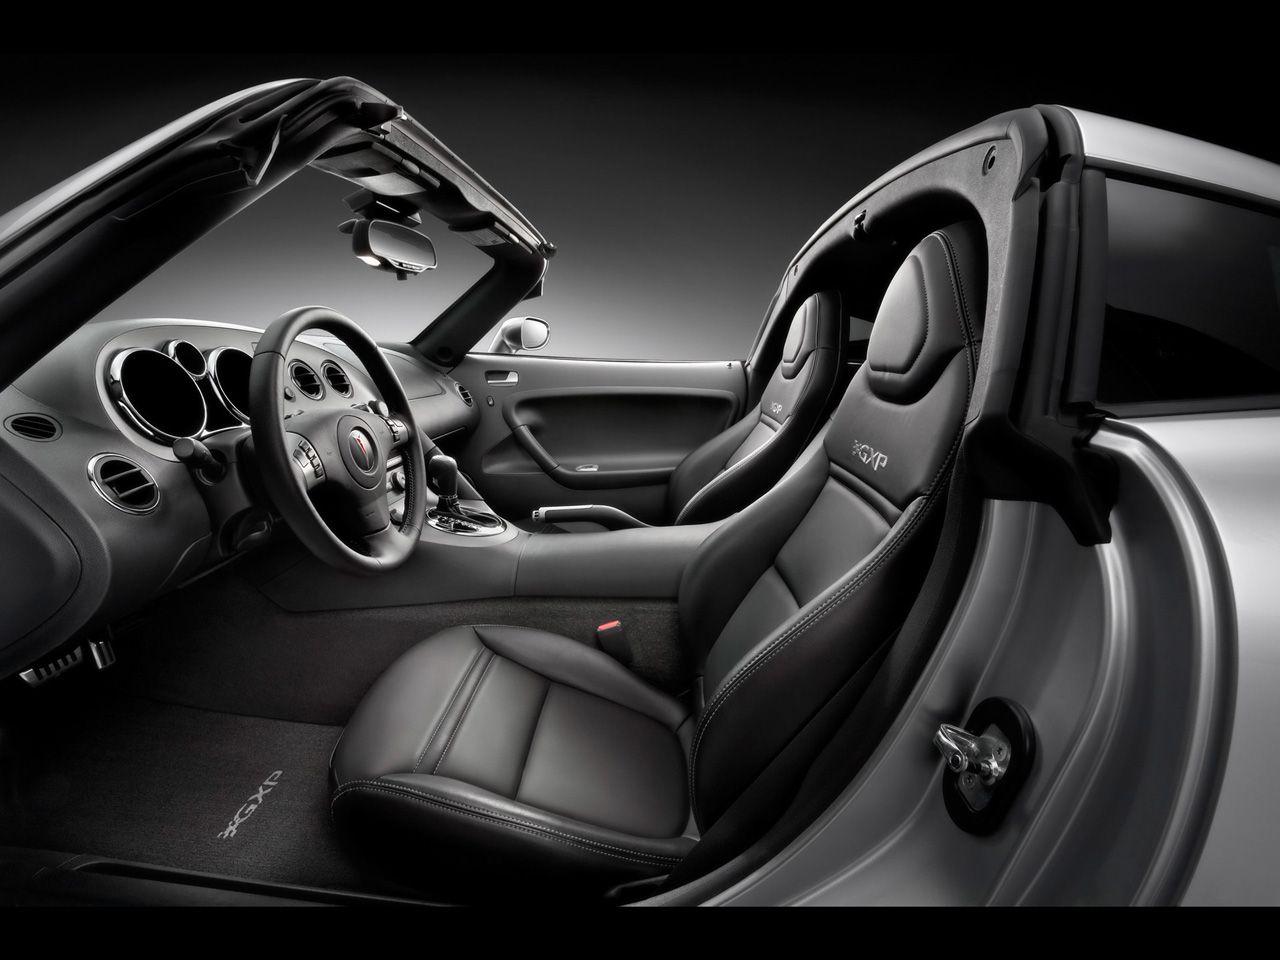 2009 pontiac solstice coupe interior image general motors